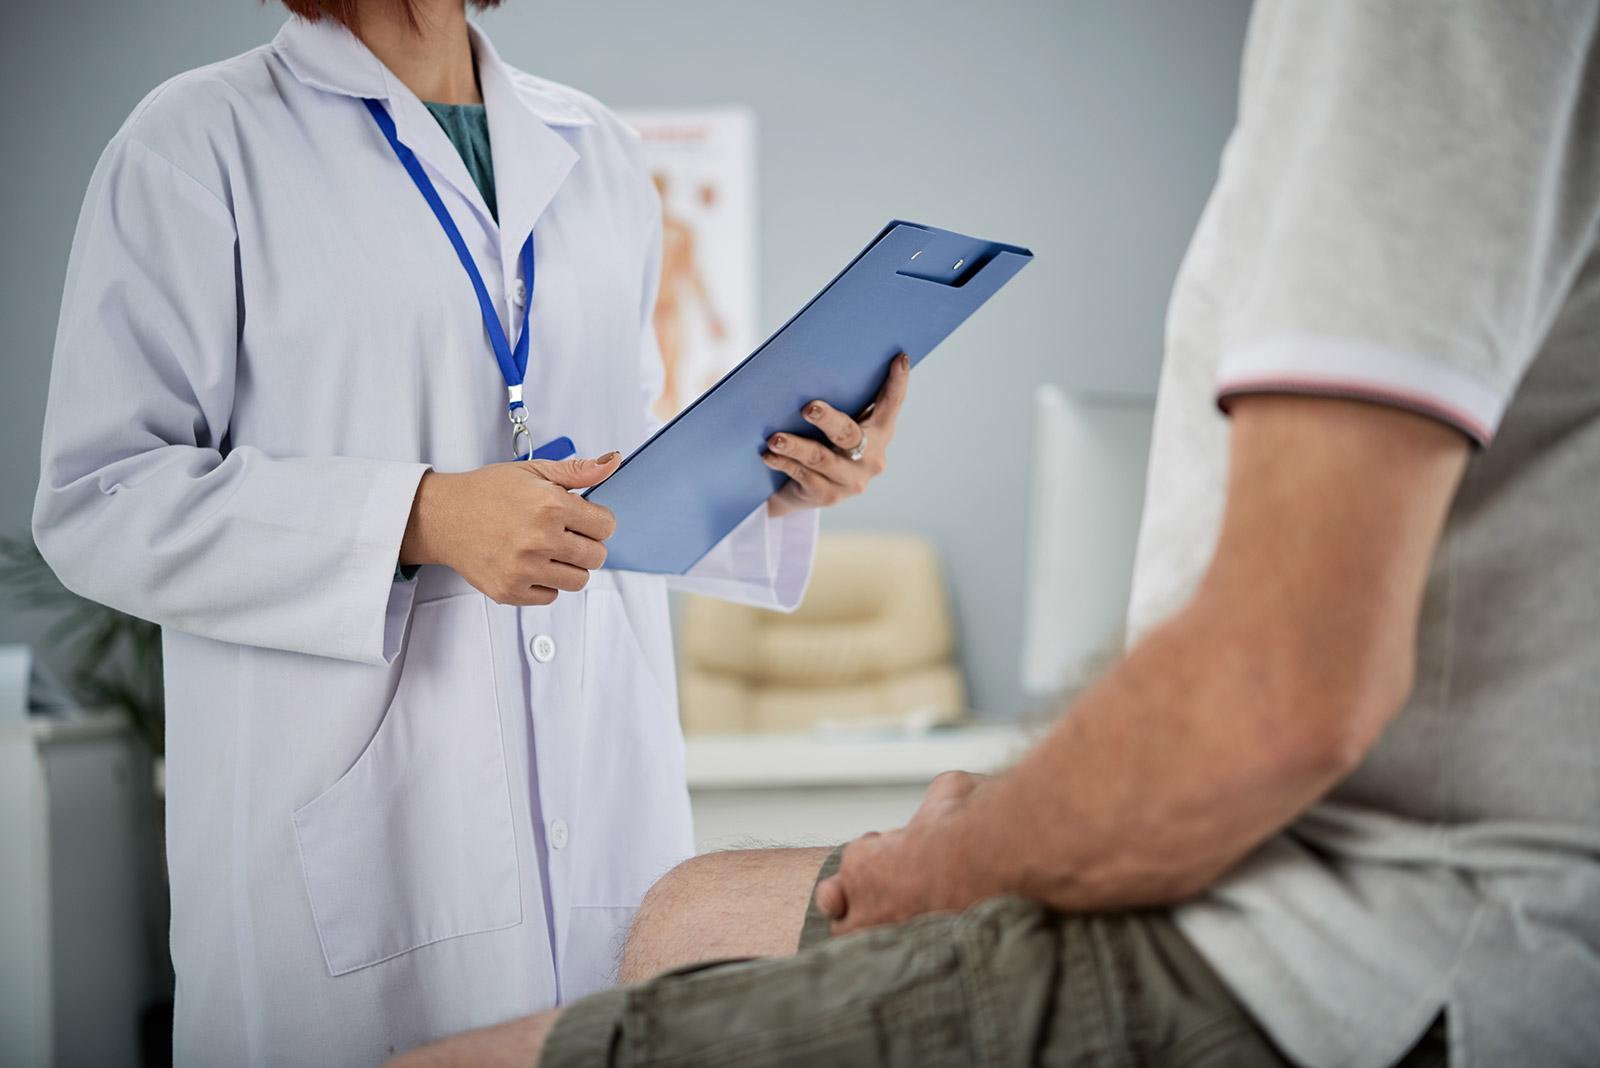 Medical exam weight loss clinic Santa Clarita